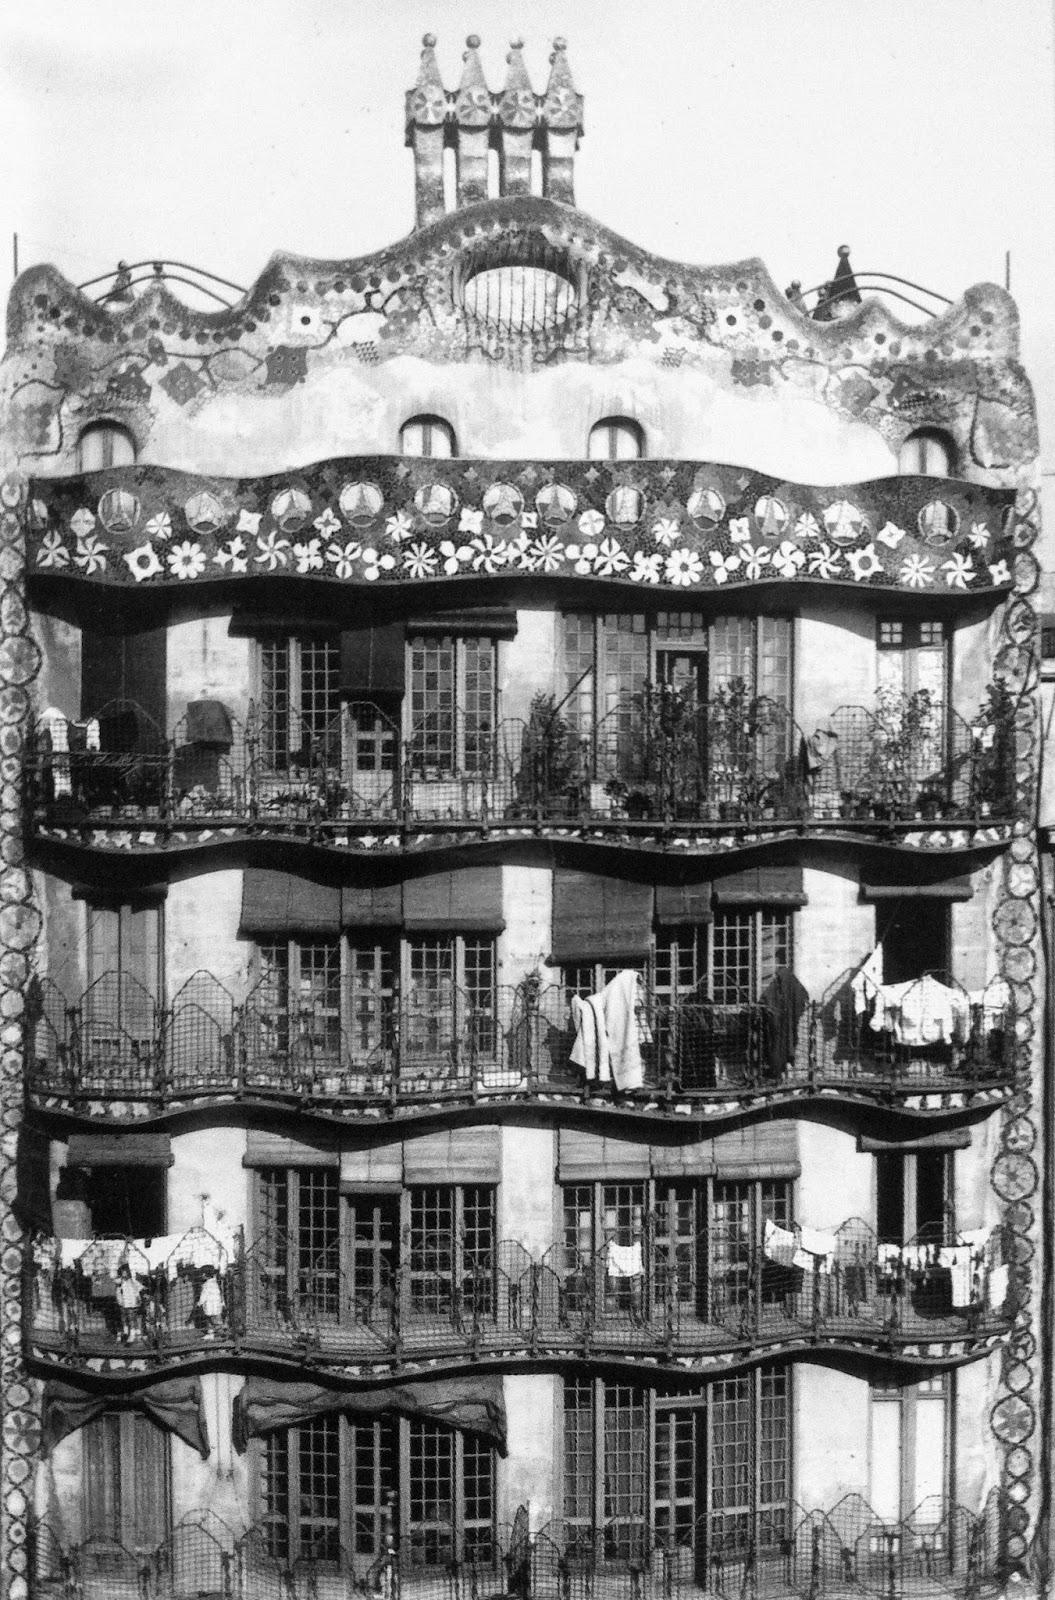 Gaudi,+casa+batll%c3%b3,+fachada+posterior,+imagen+de,+fragmentos+de+gaudi,+fondo+canosa.